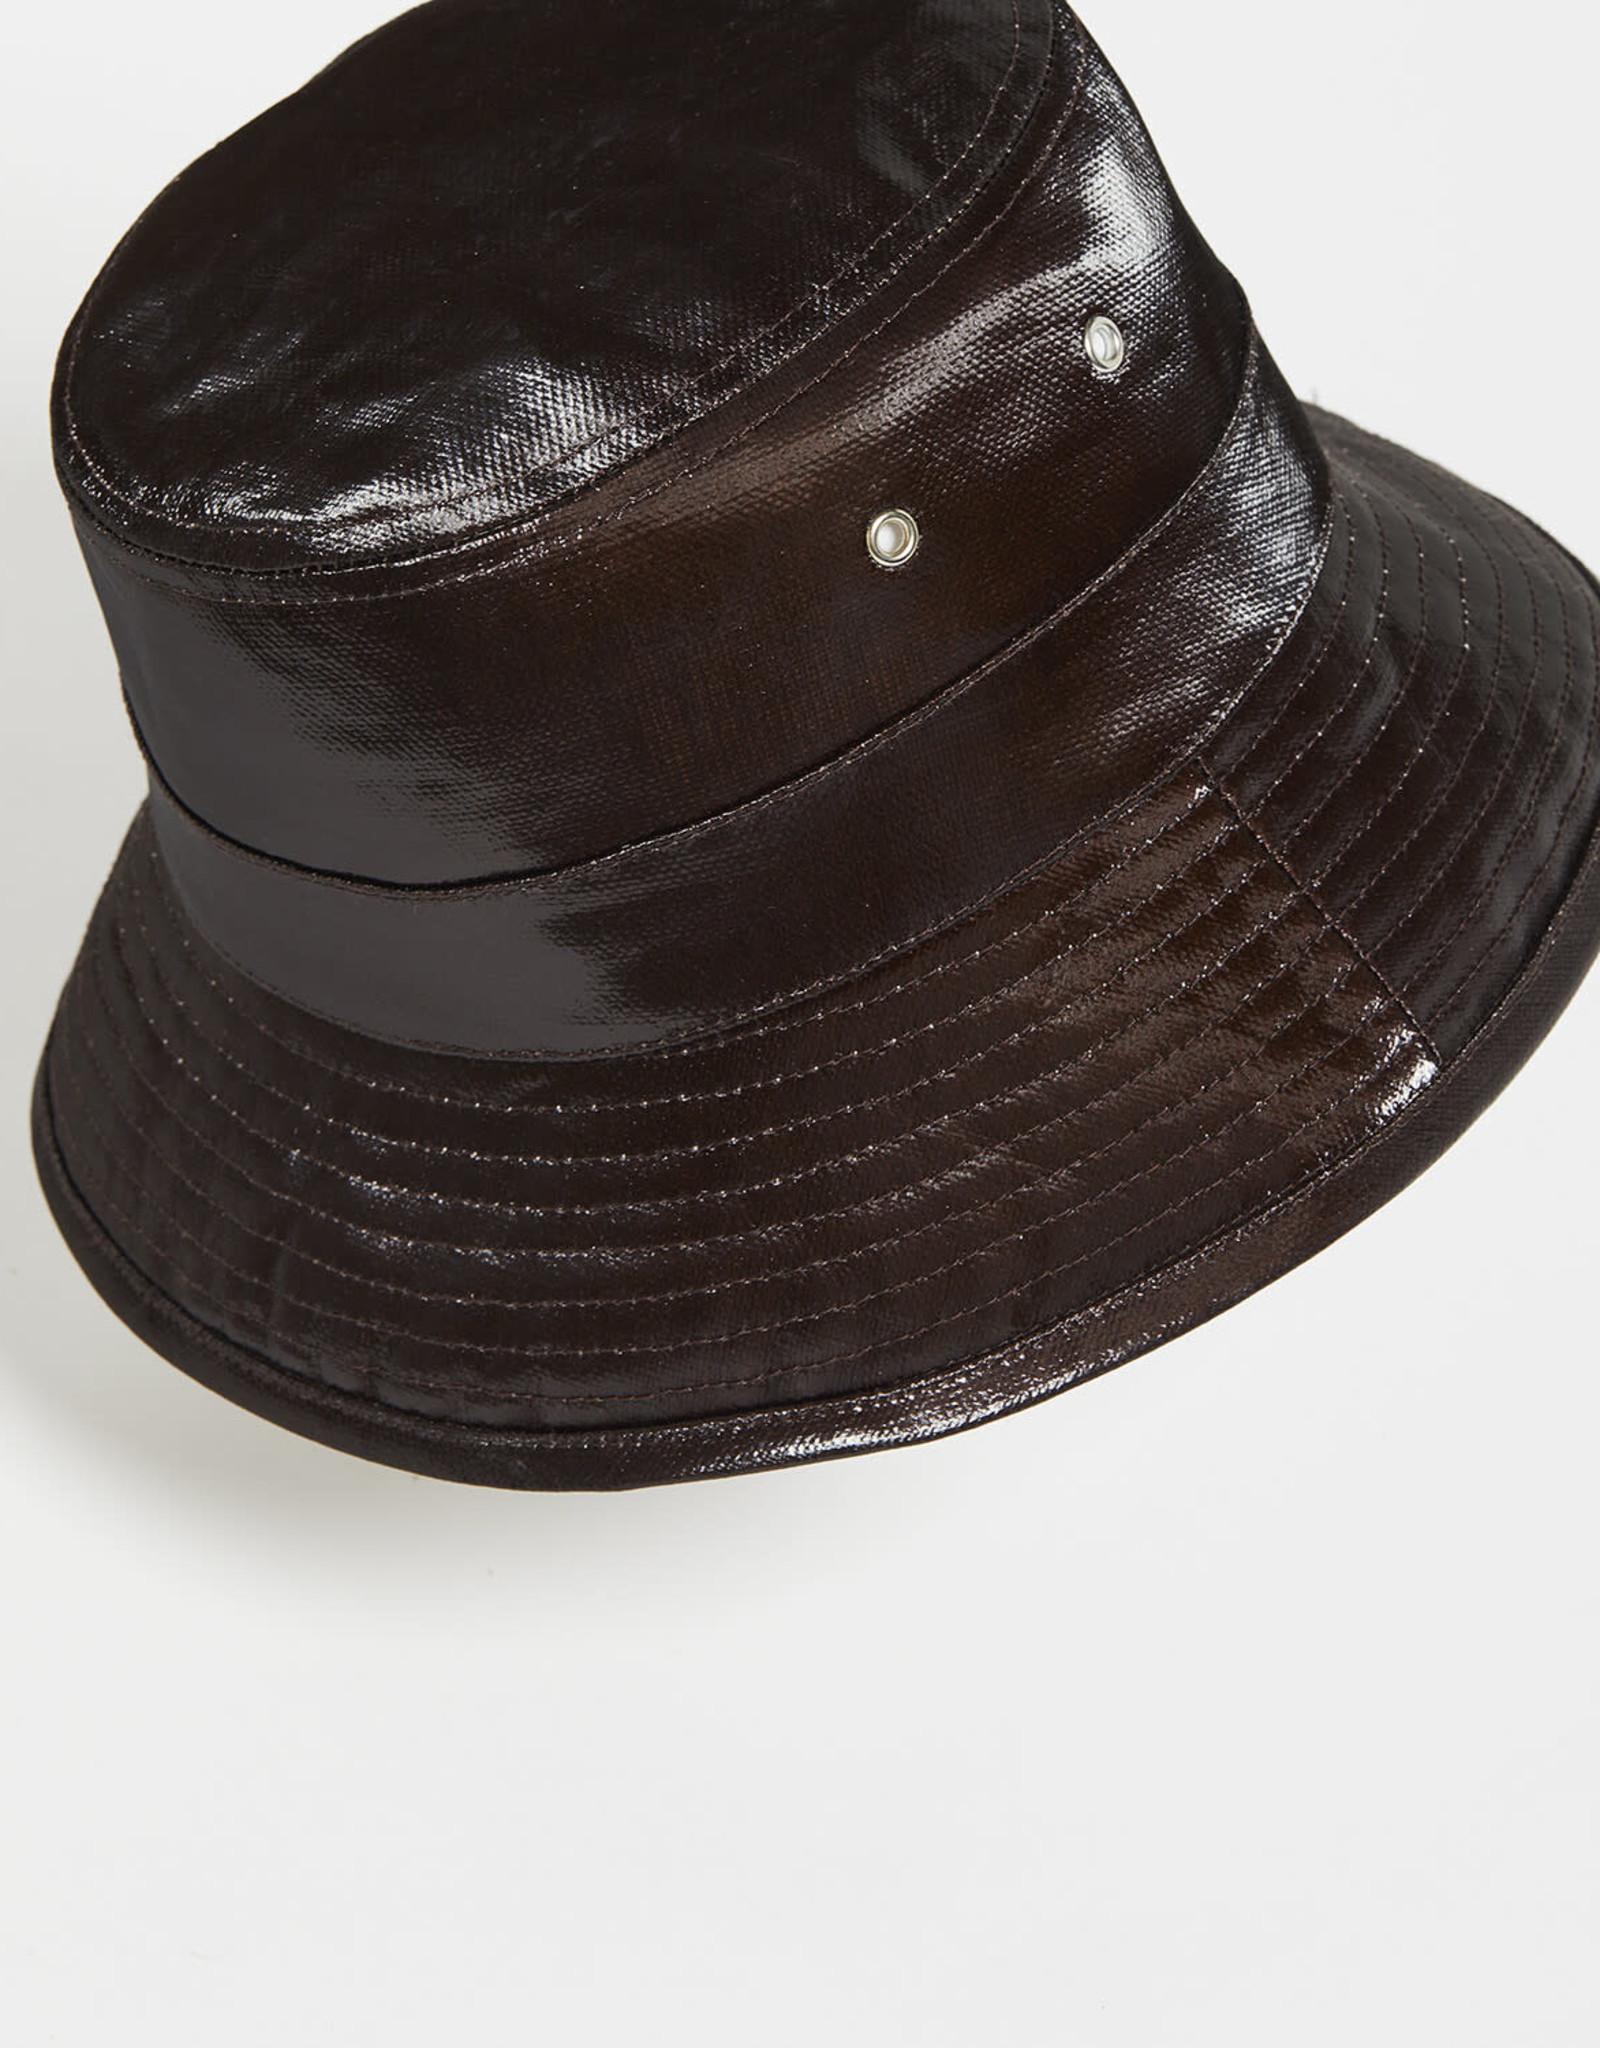 JACK GOMME Bob Bucket Hat